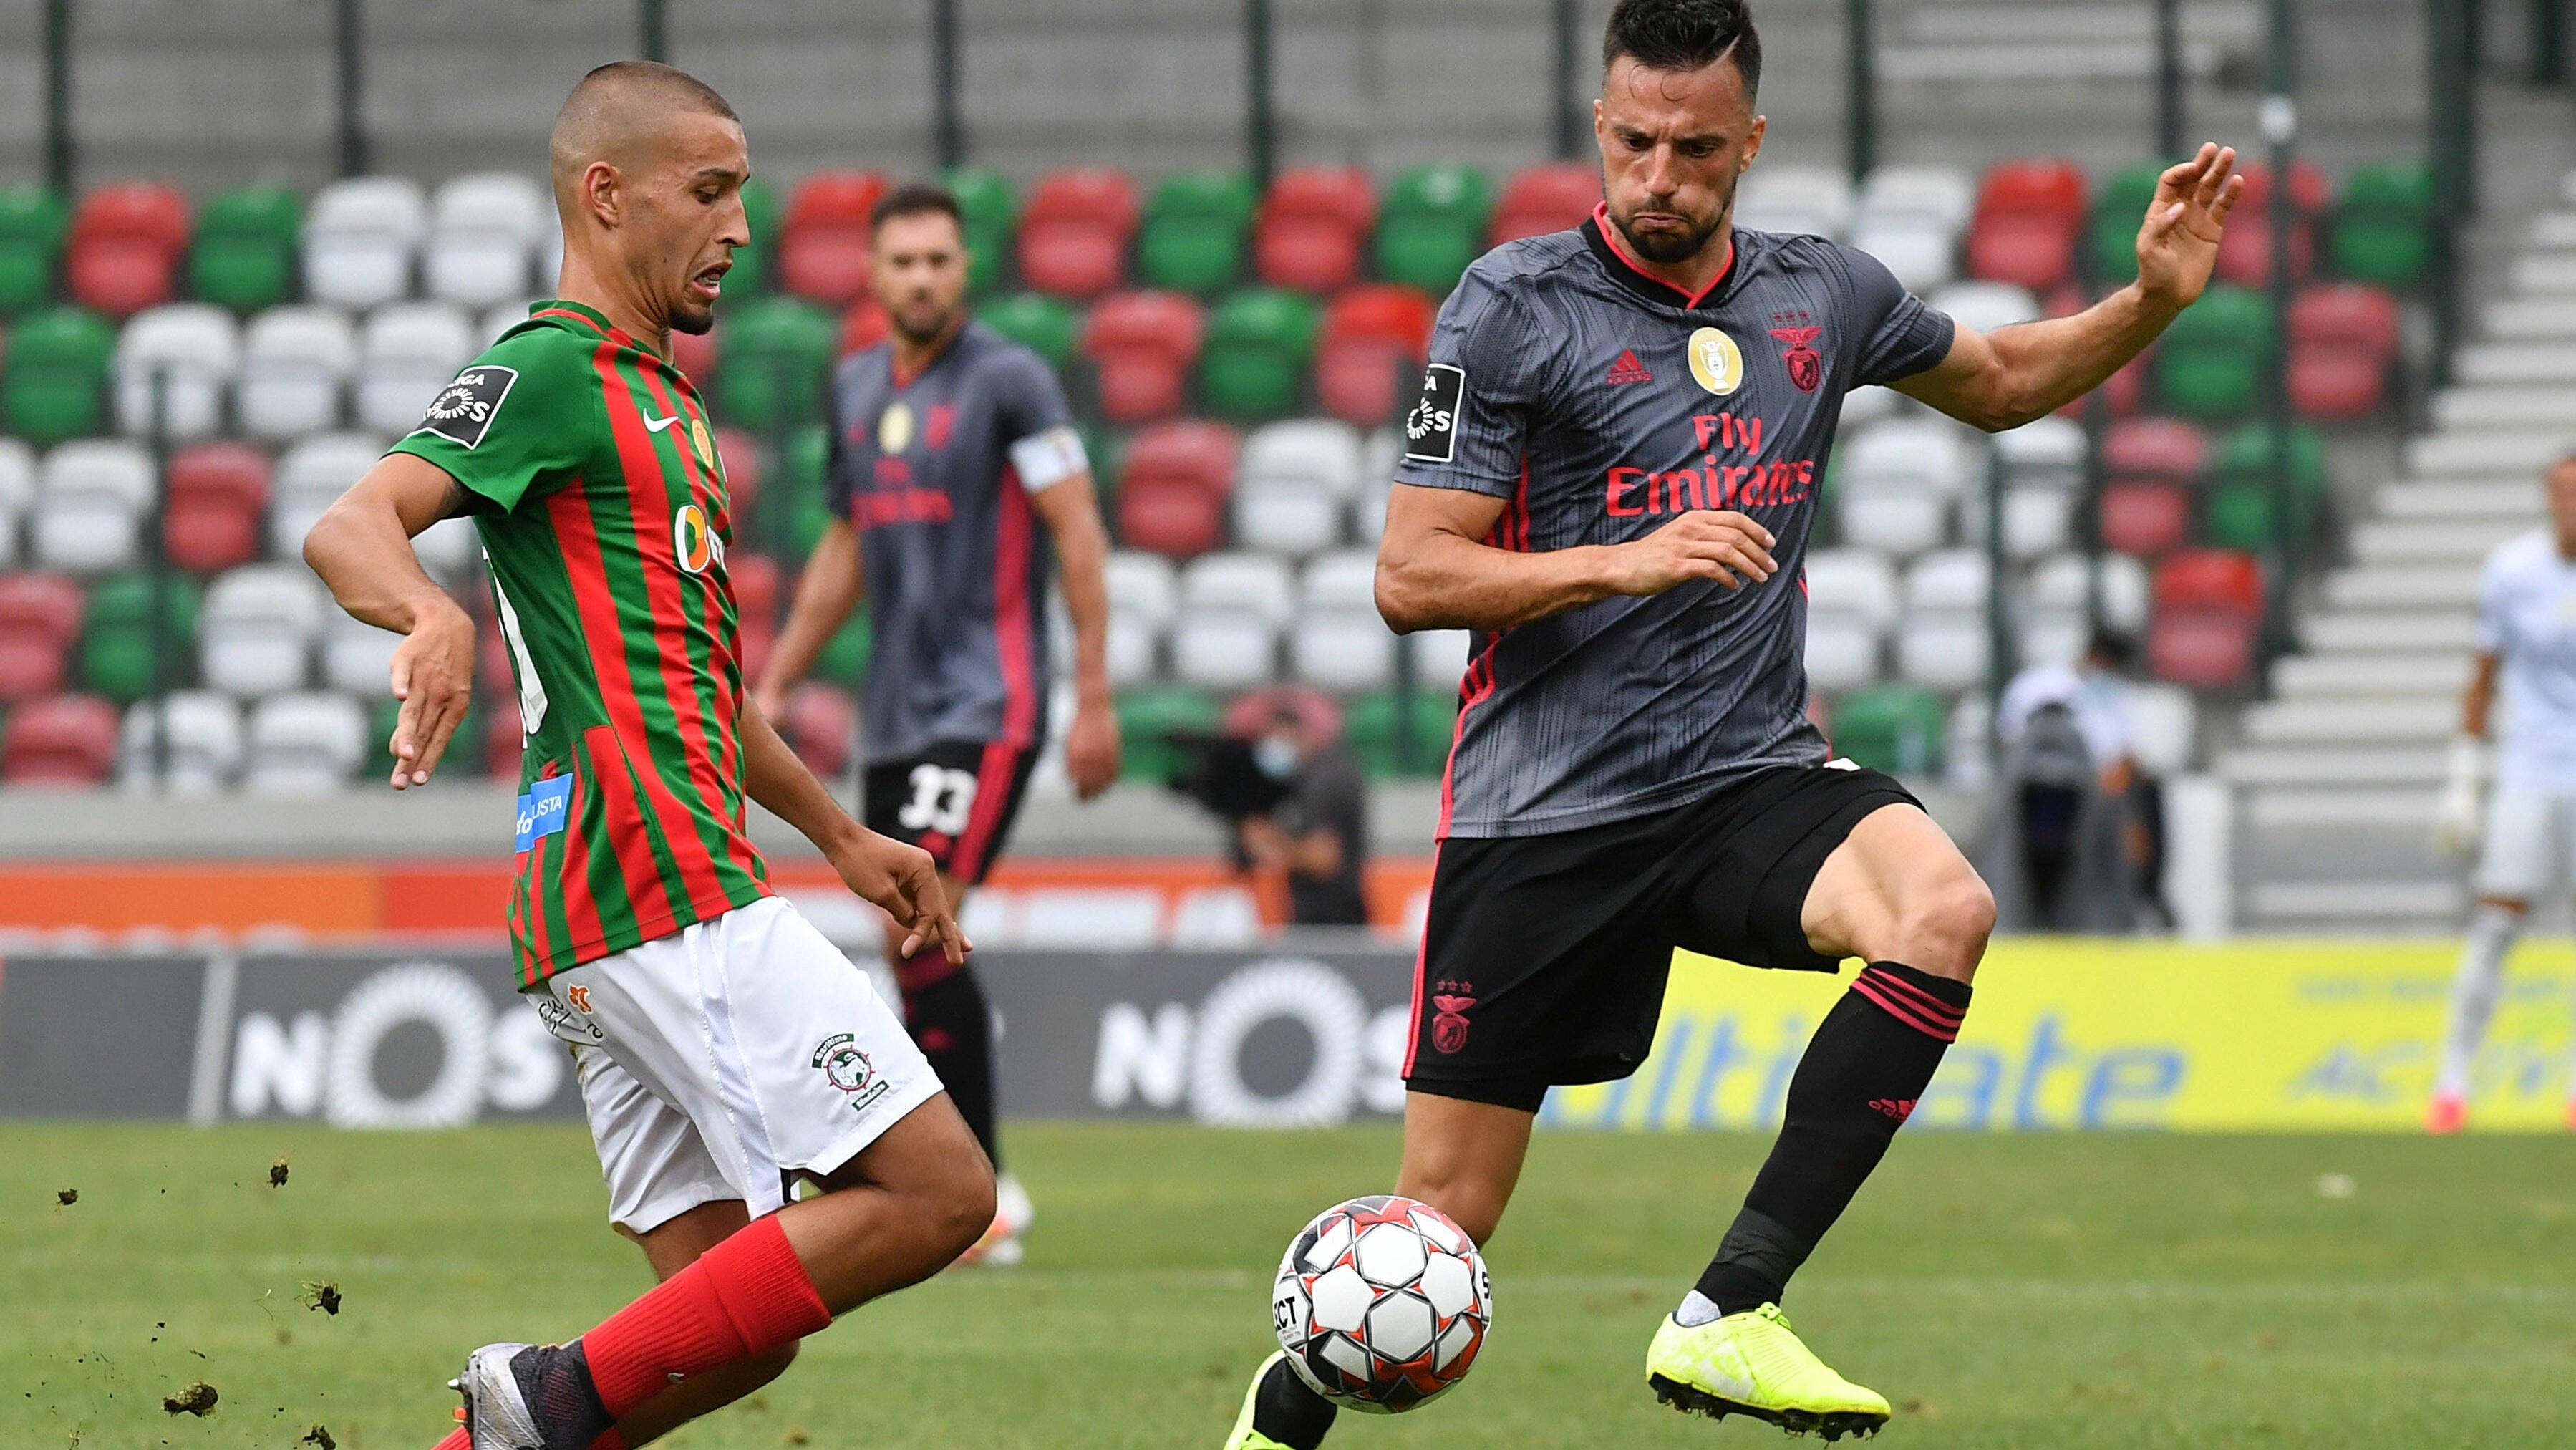 Famalicão Gegen Benfica